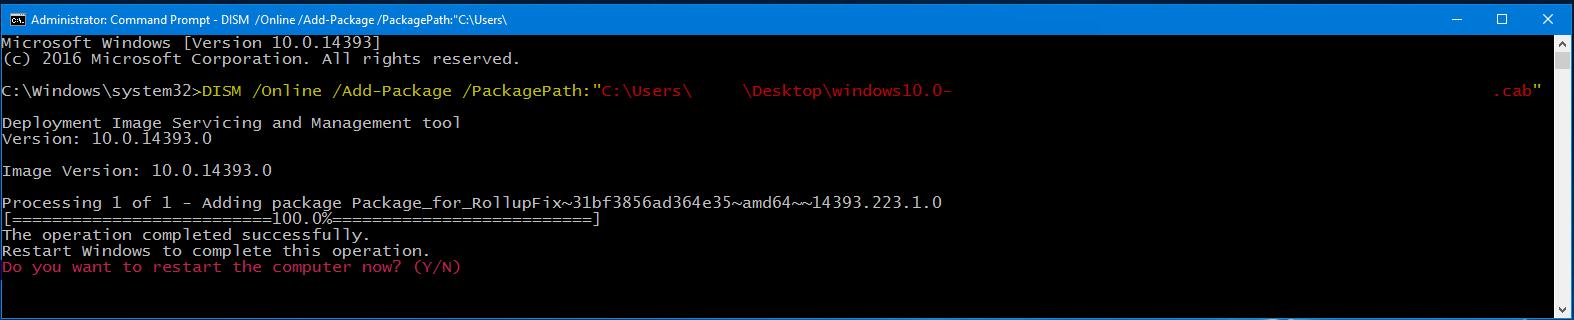 Install CAB command - Windows 10 έκδοση 1903 λήγει στις 8 Δεκεμβρίου του 2020